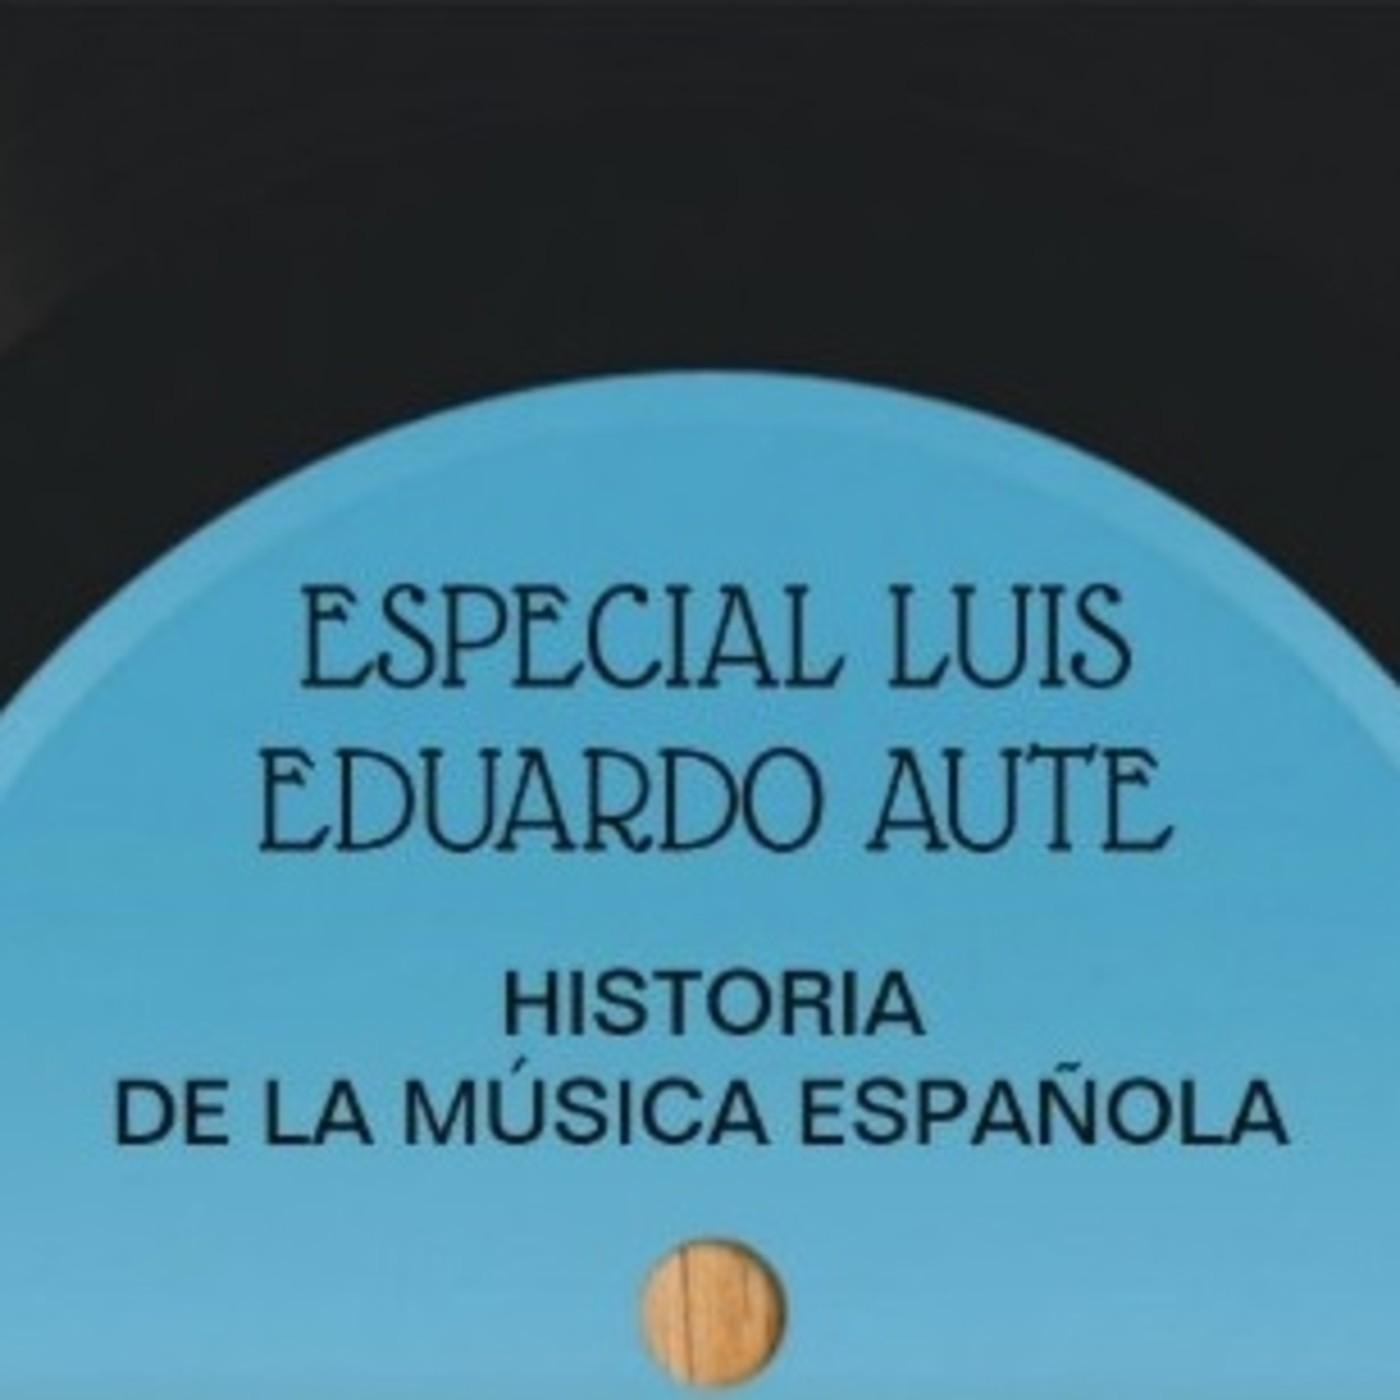 Especial Luis Eduardo Aute - Historia de la Música Española.